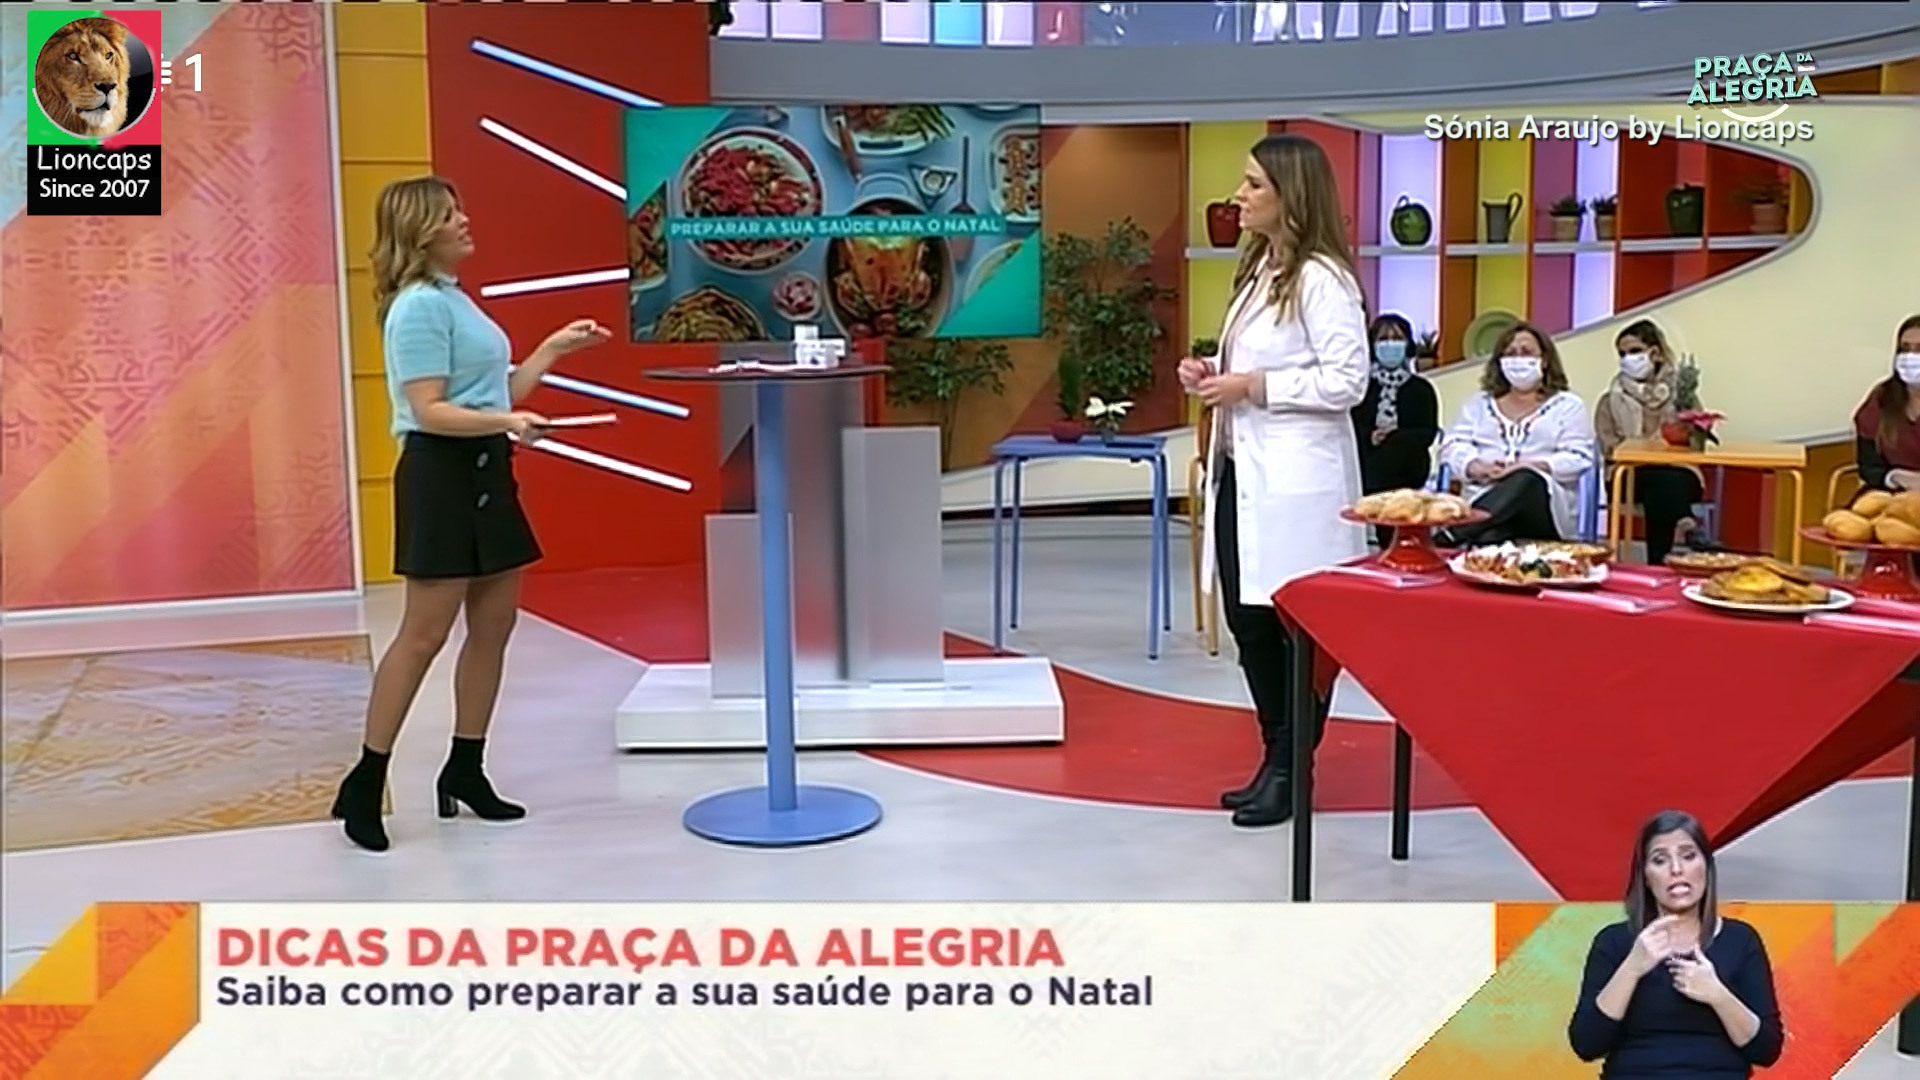 sonia_araujo_praca_lioncaps_27_03_2021_02 (12).jpg